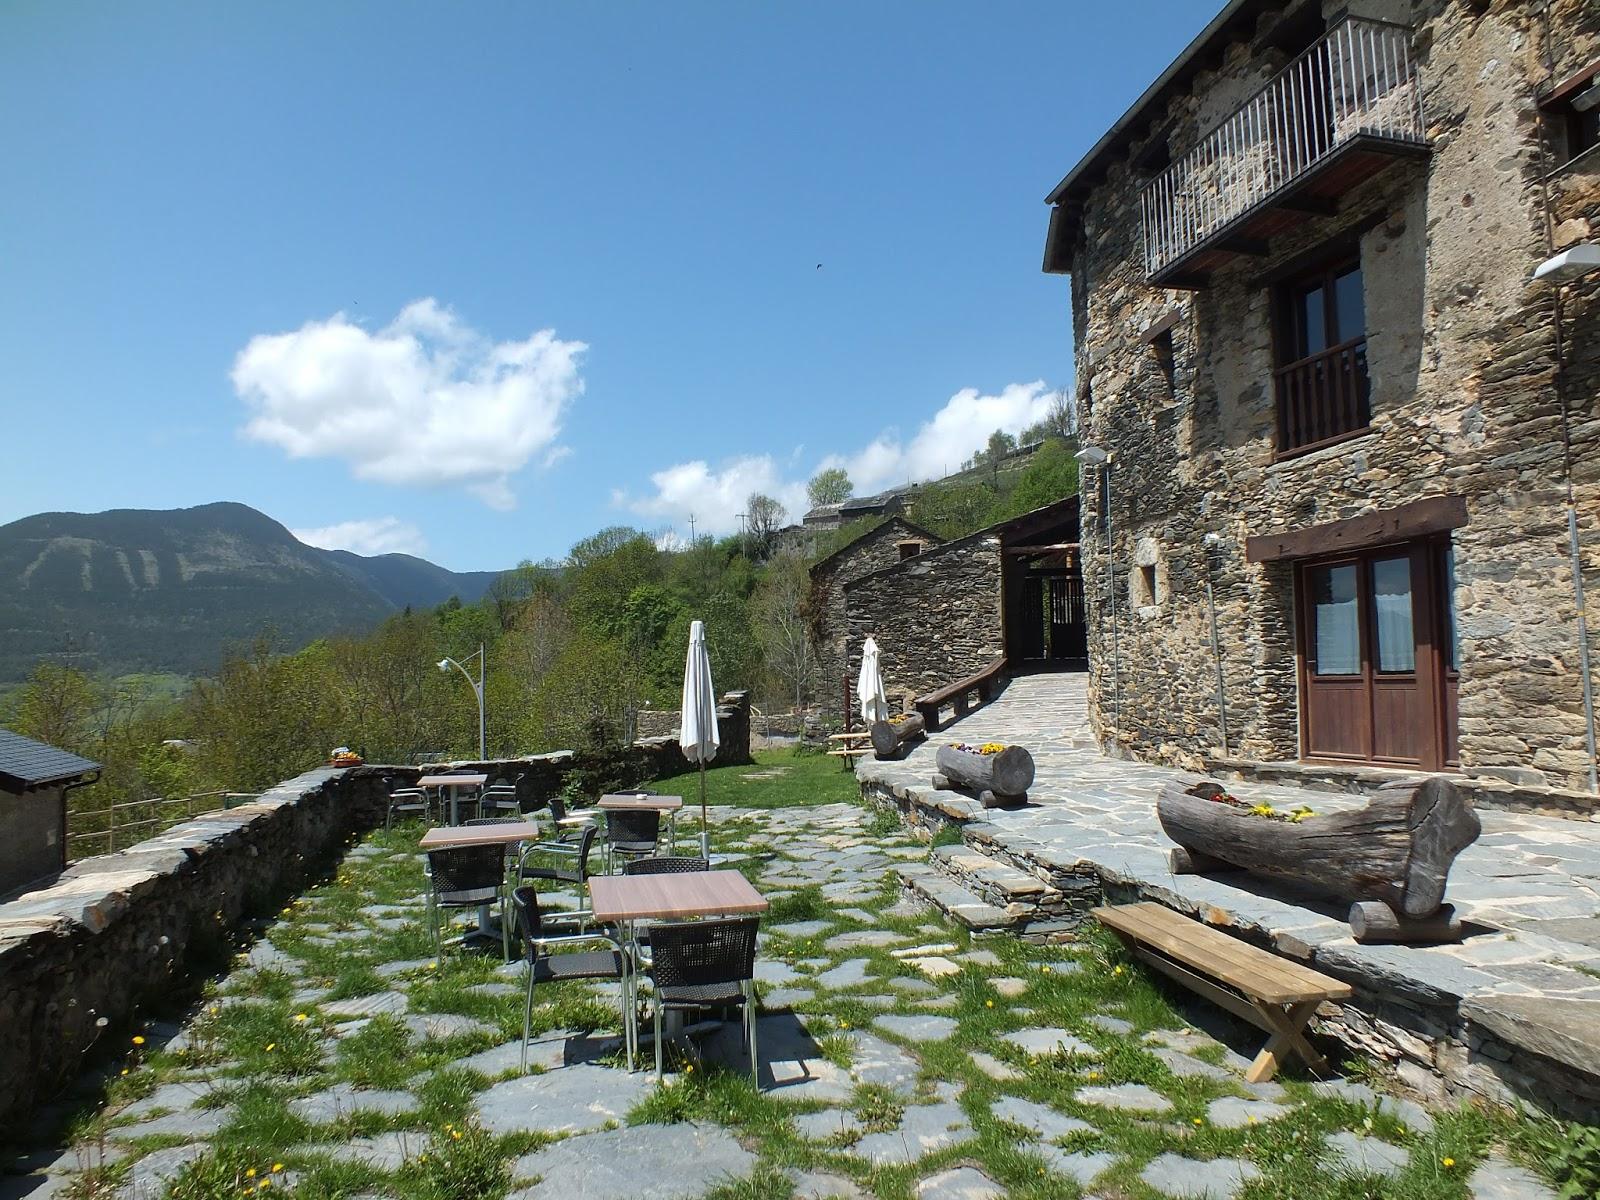 Ruralverd casa rural serrat queralbs ripoll s 13125 - Casa rural queralbs ...